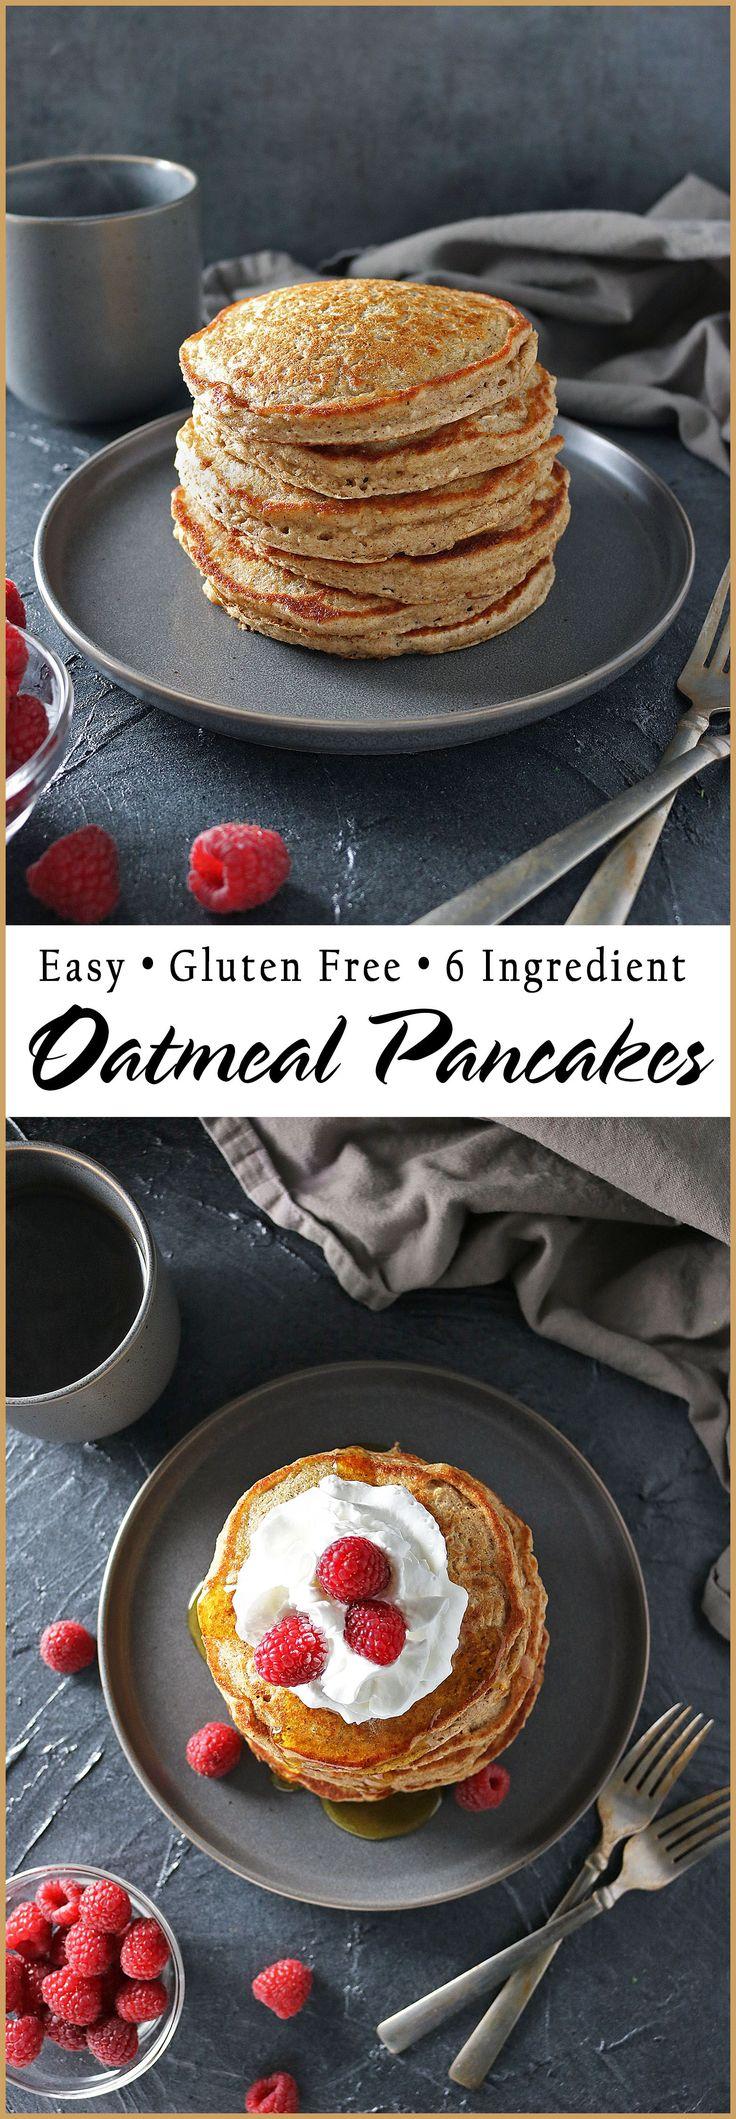 Easy Gluten Free 6-Ingredient Oatmeal Pancakes